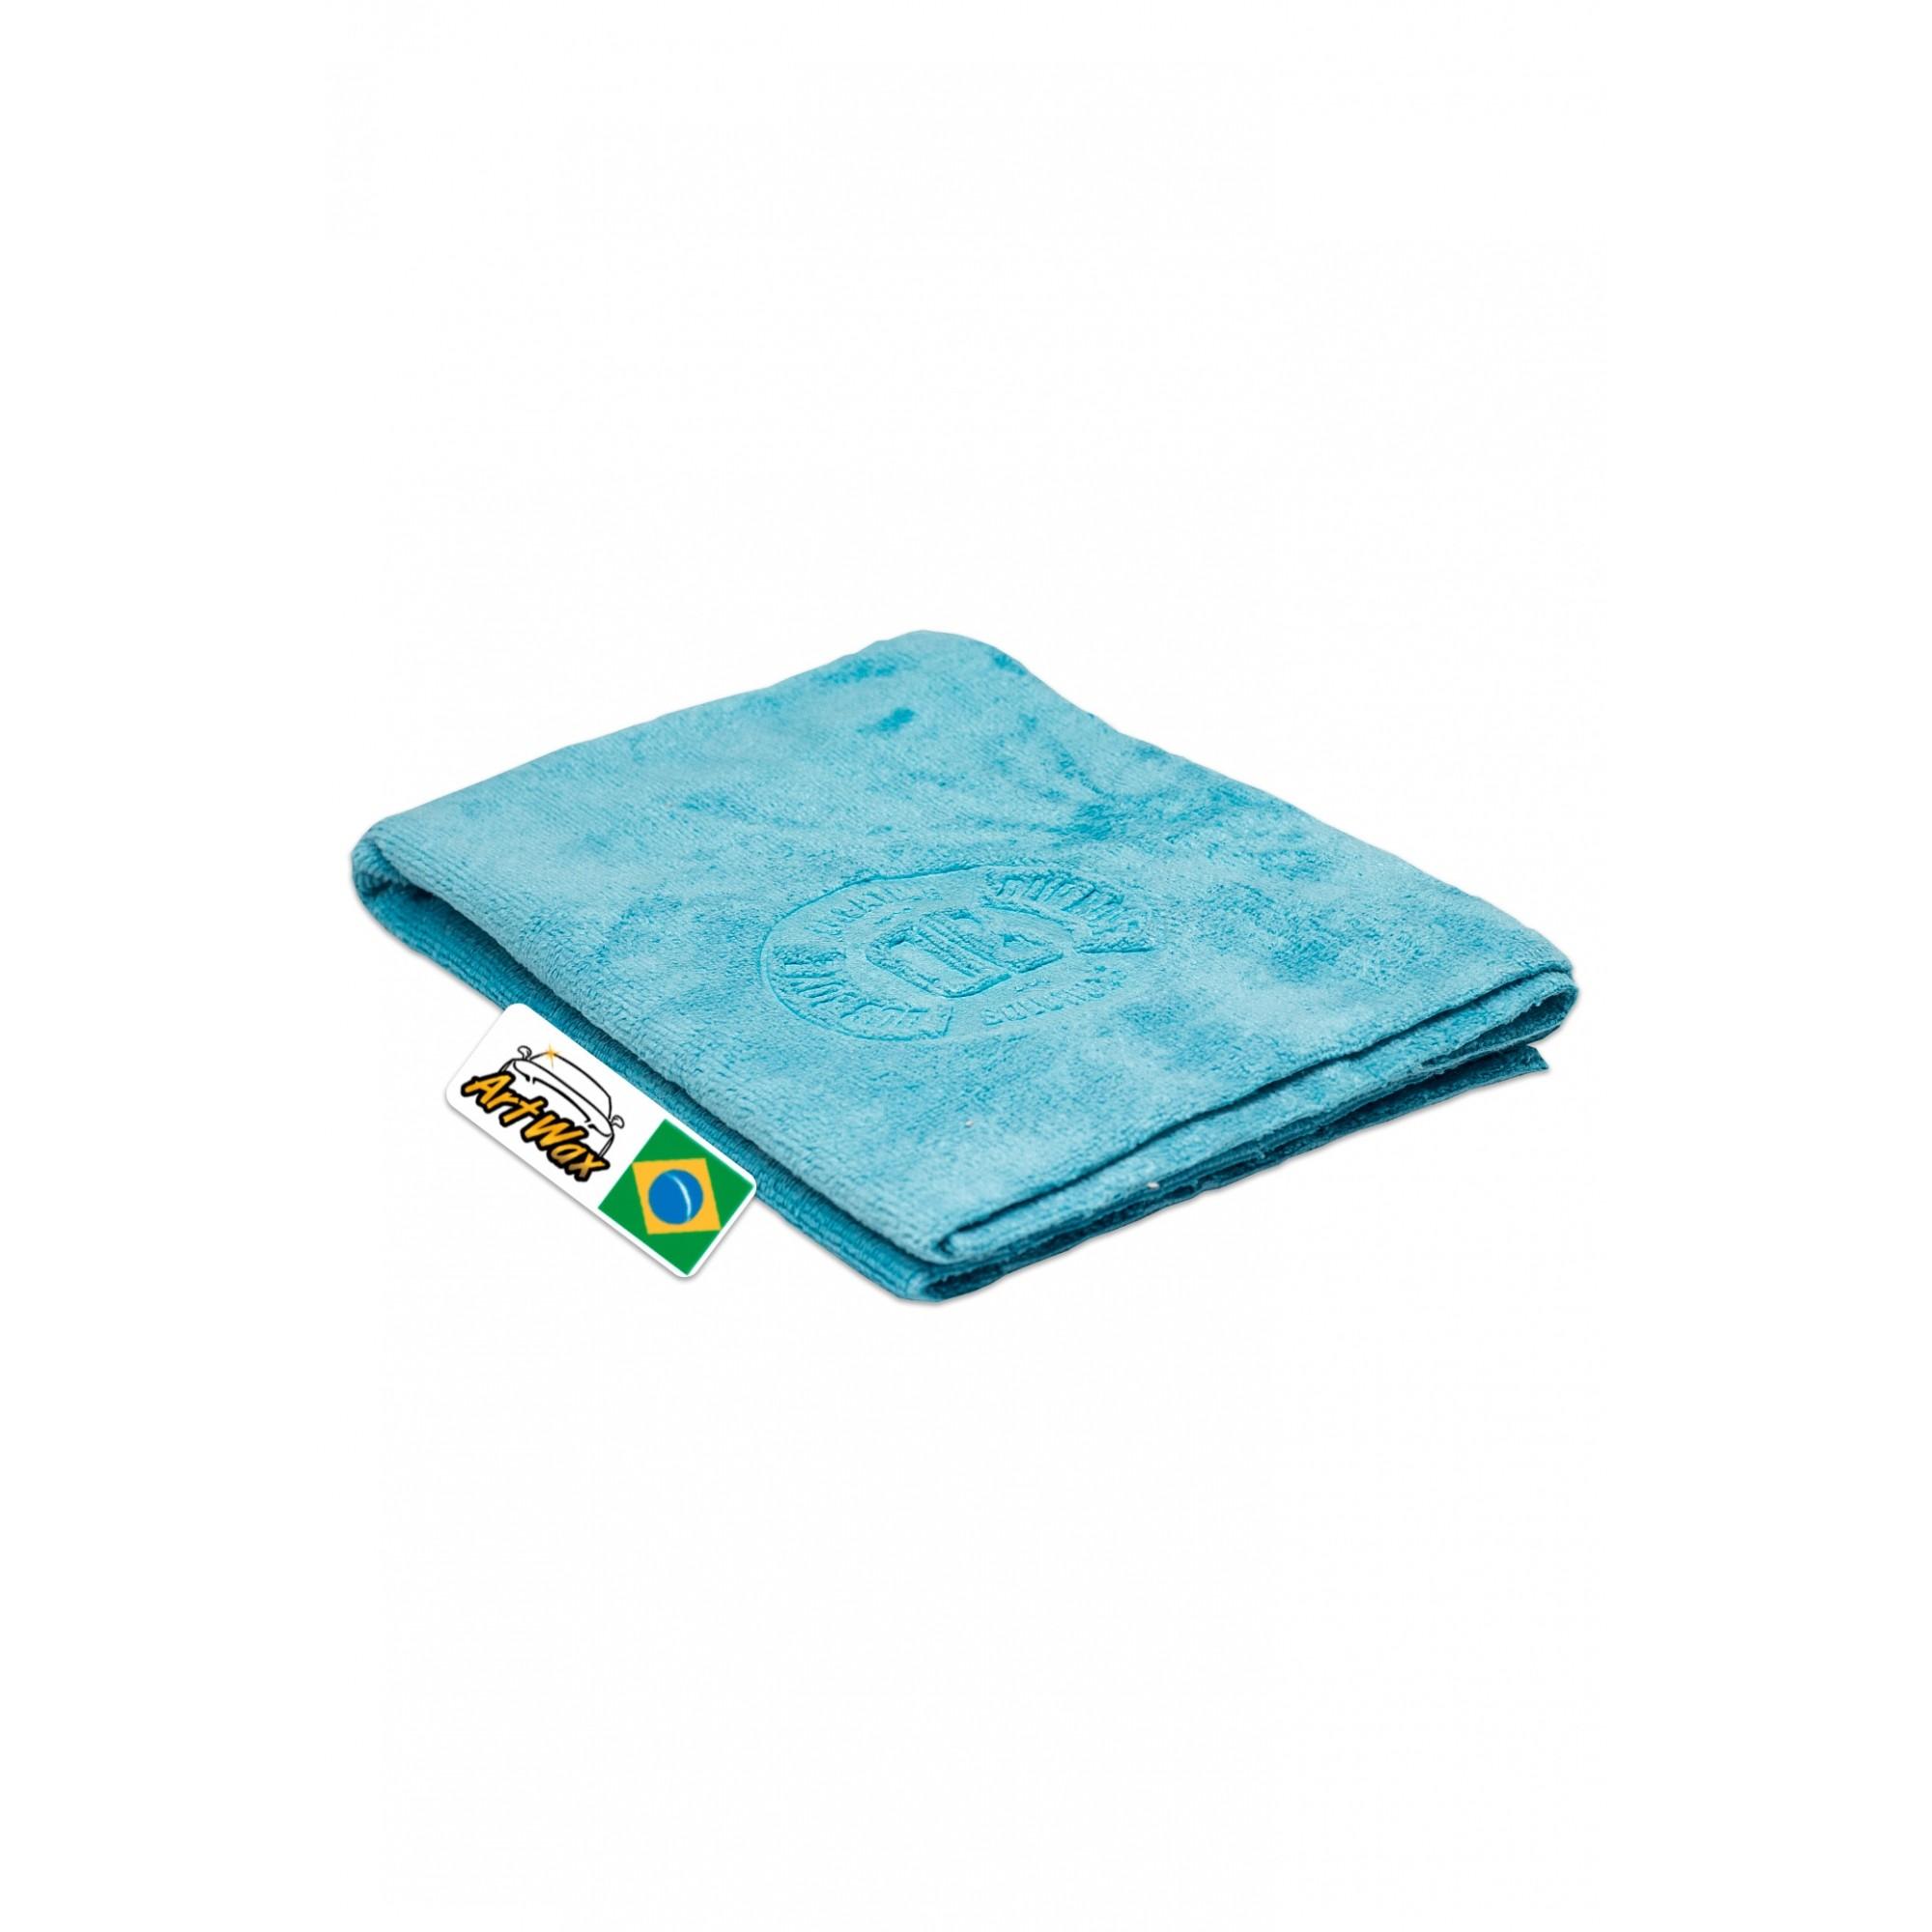 Toalha de Microfibra Azul DB Towel 40x40cm - 350gsm Dub Boyz